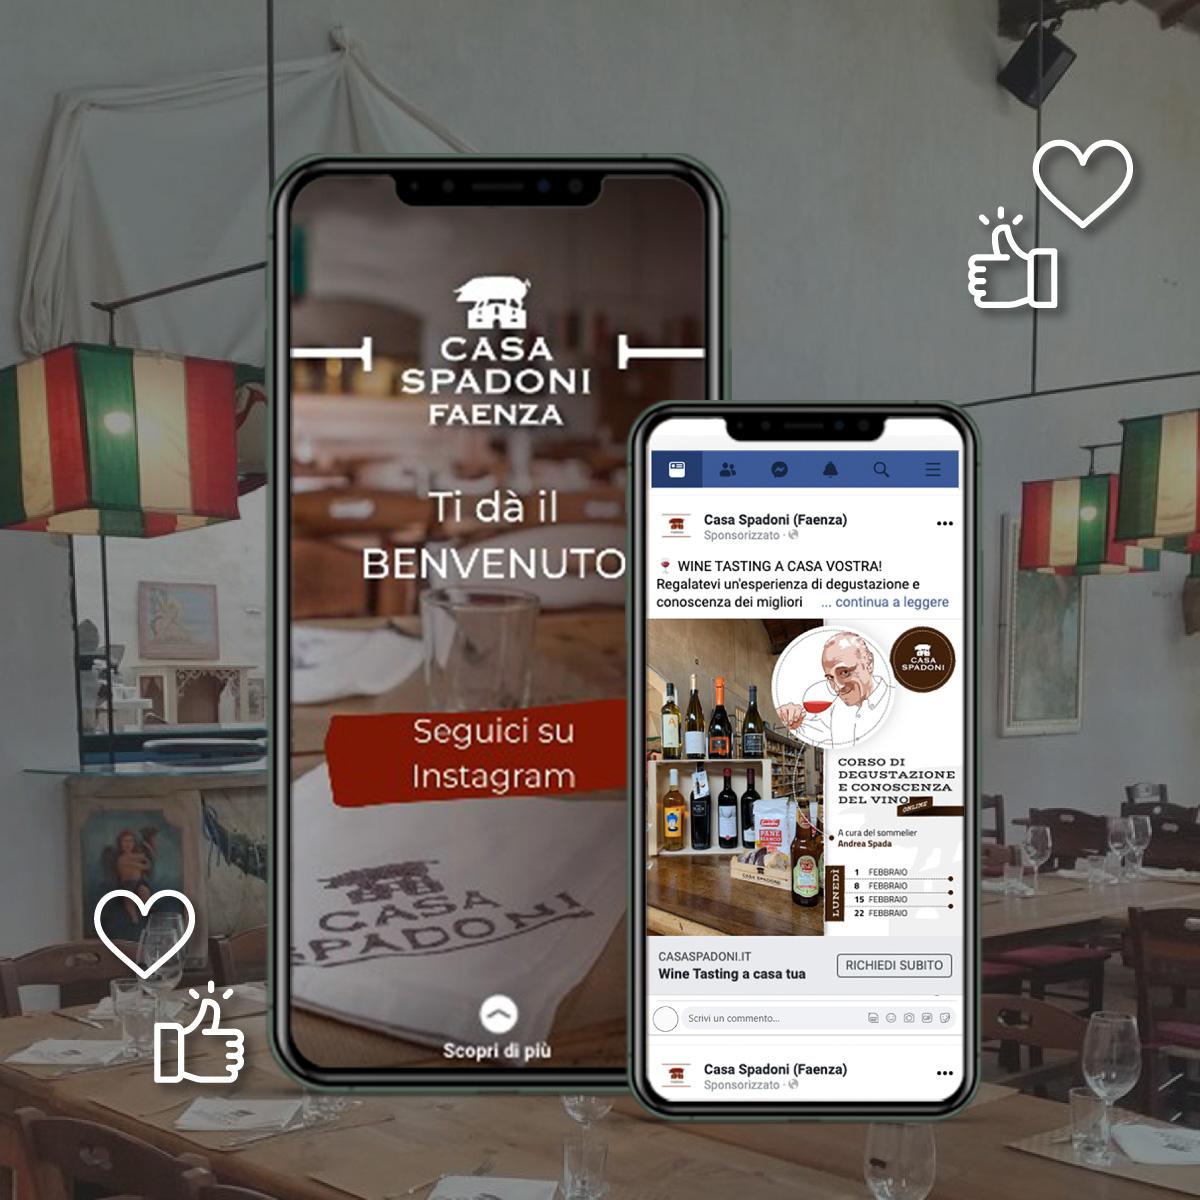 ristoranti-casa-spadoni-food-marketing-digital-advertising-2